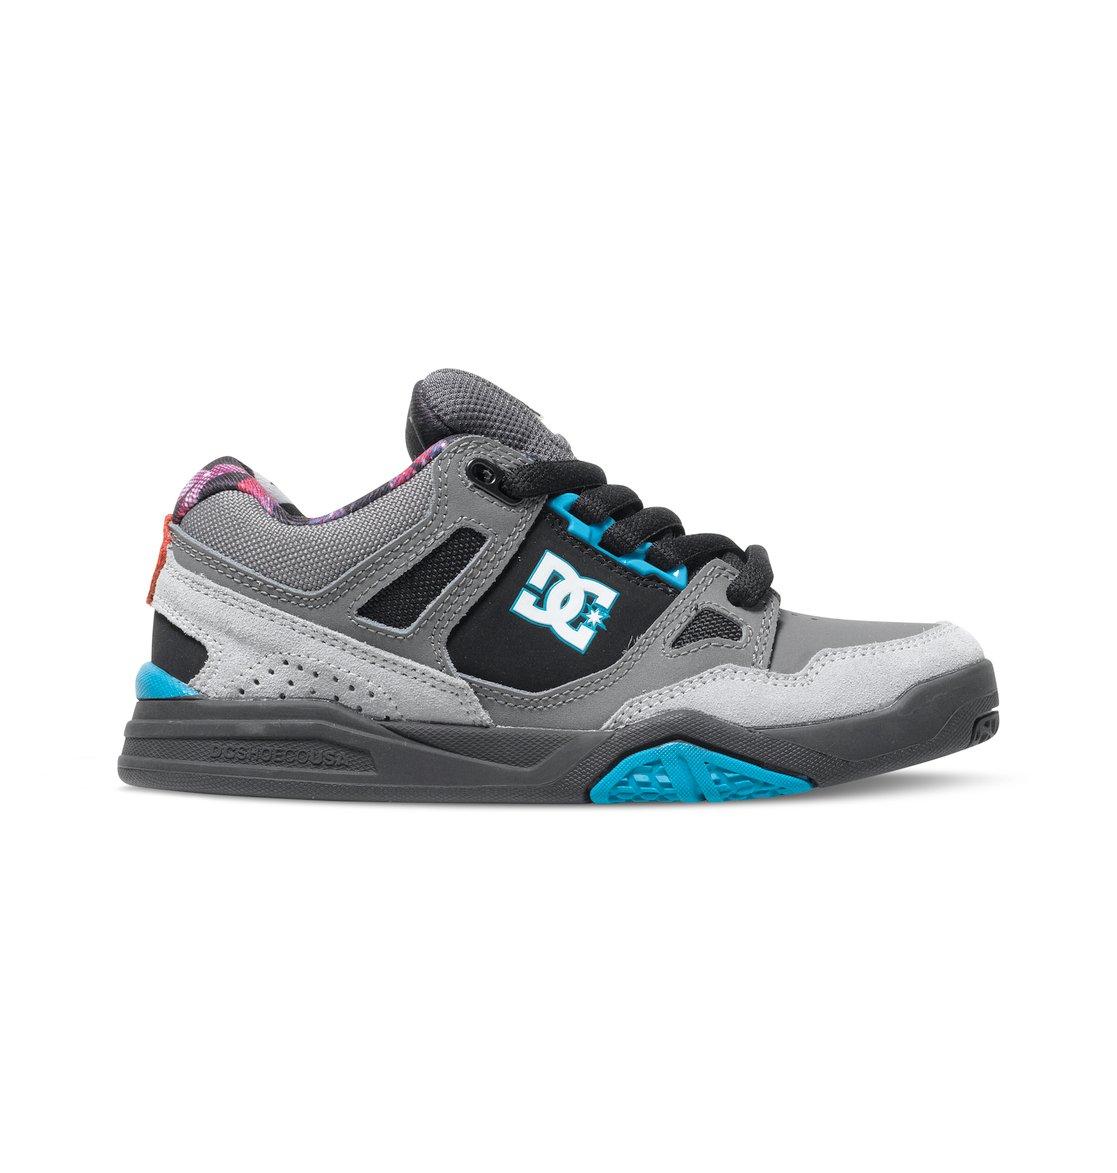 buy online 40d1a 07154 Boy's 8-16 Stag 2 Ken Block Shoes ADBS100148   DC Shoes